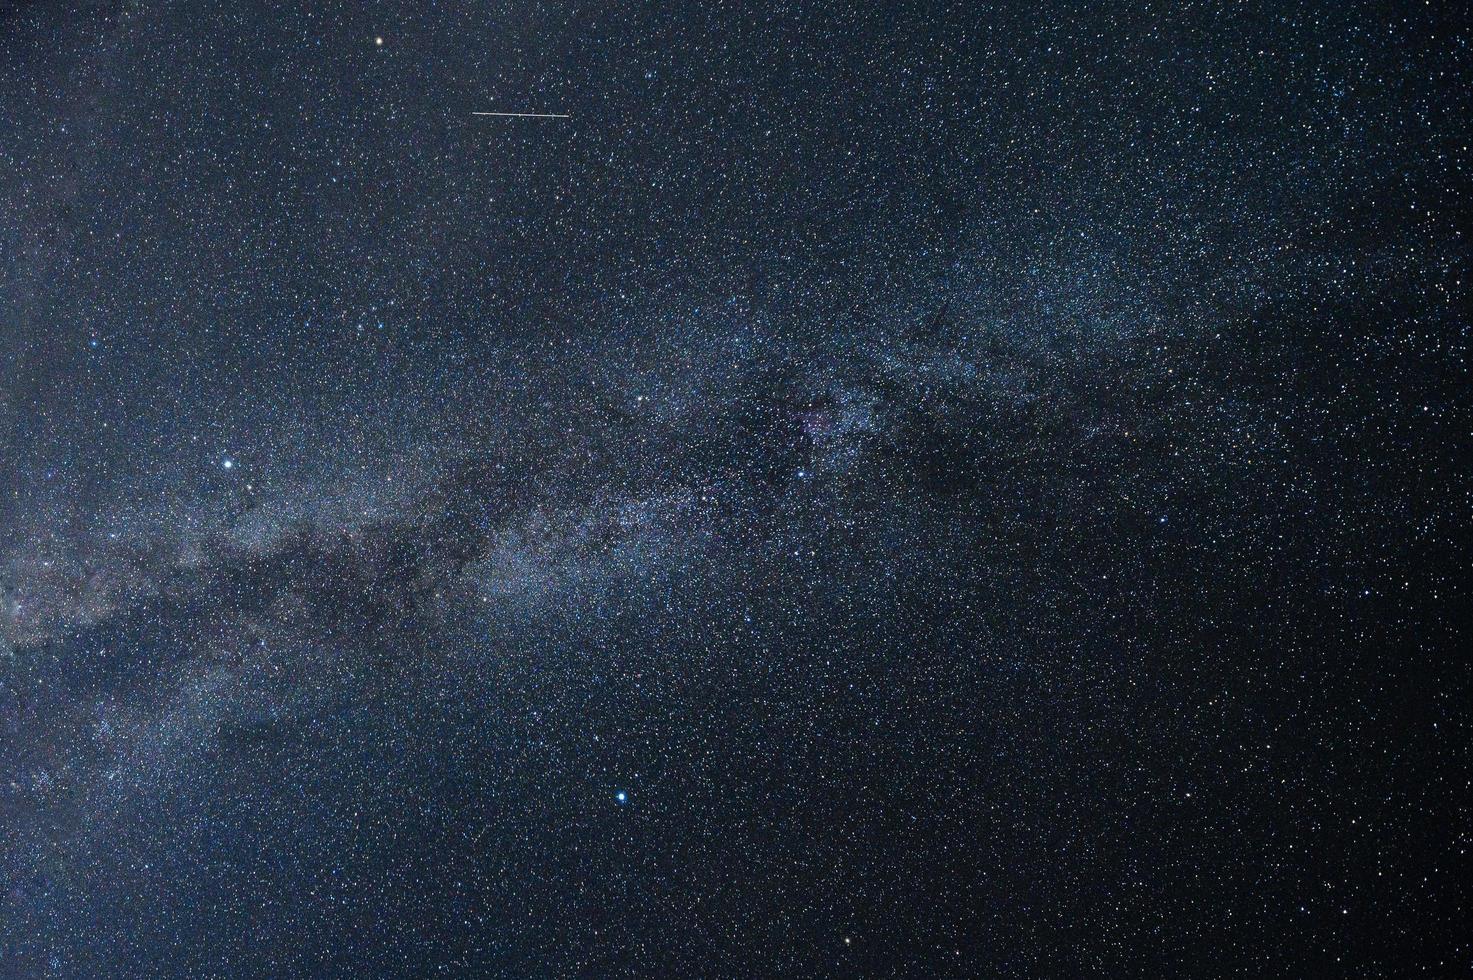 scena notturna della Via Lattea foto